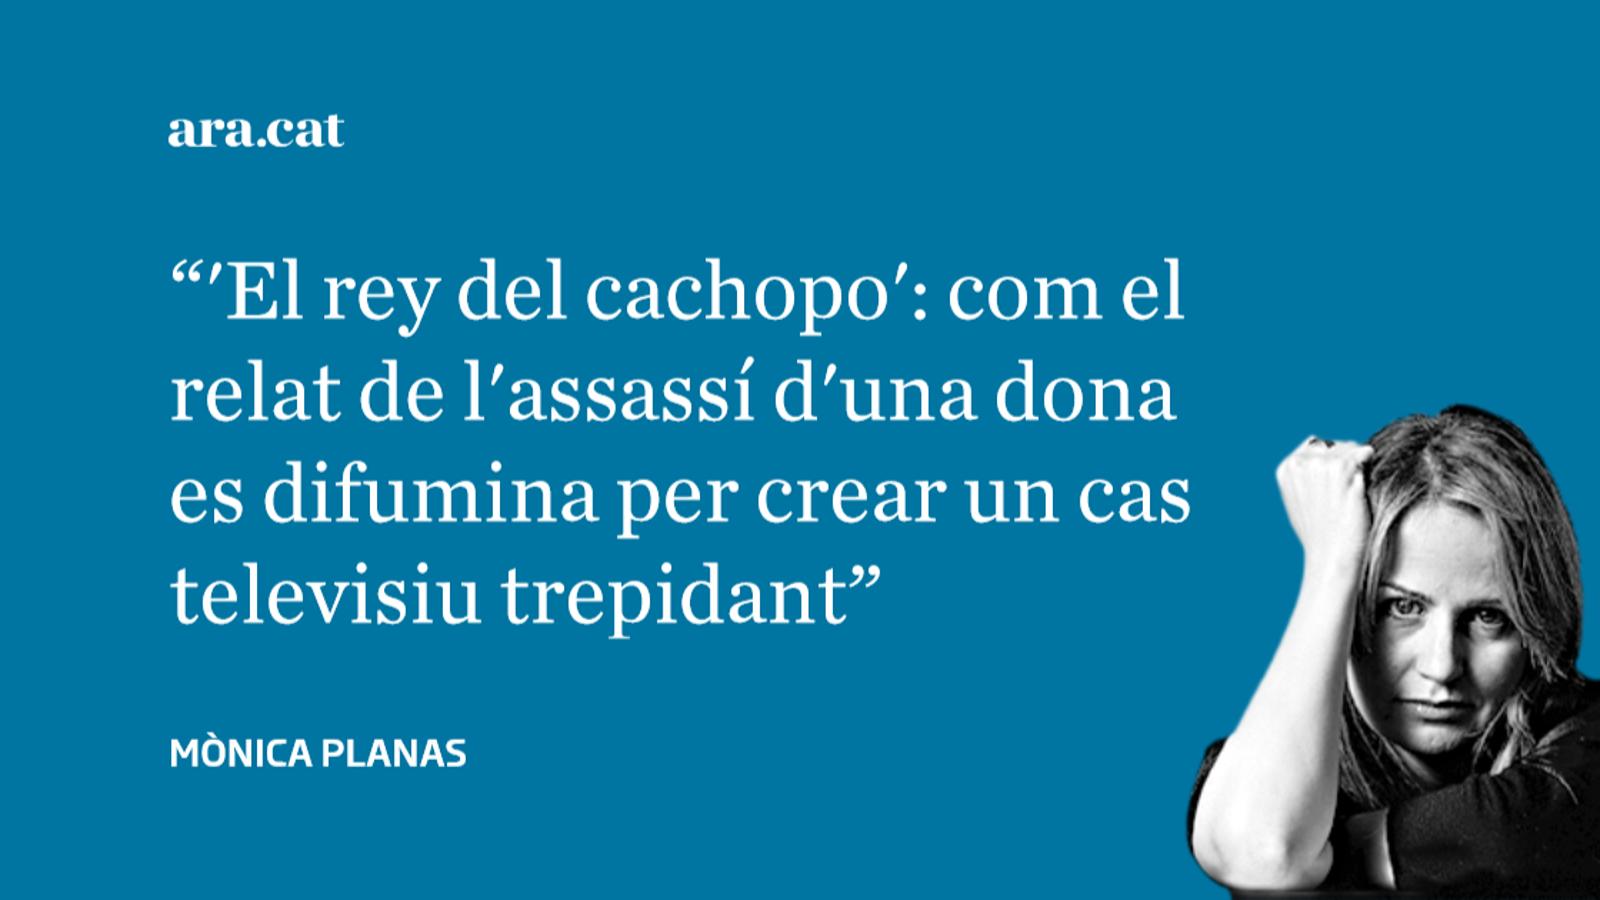 Article Mònica Planas 18/11/2018